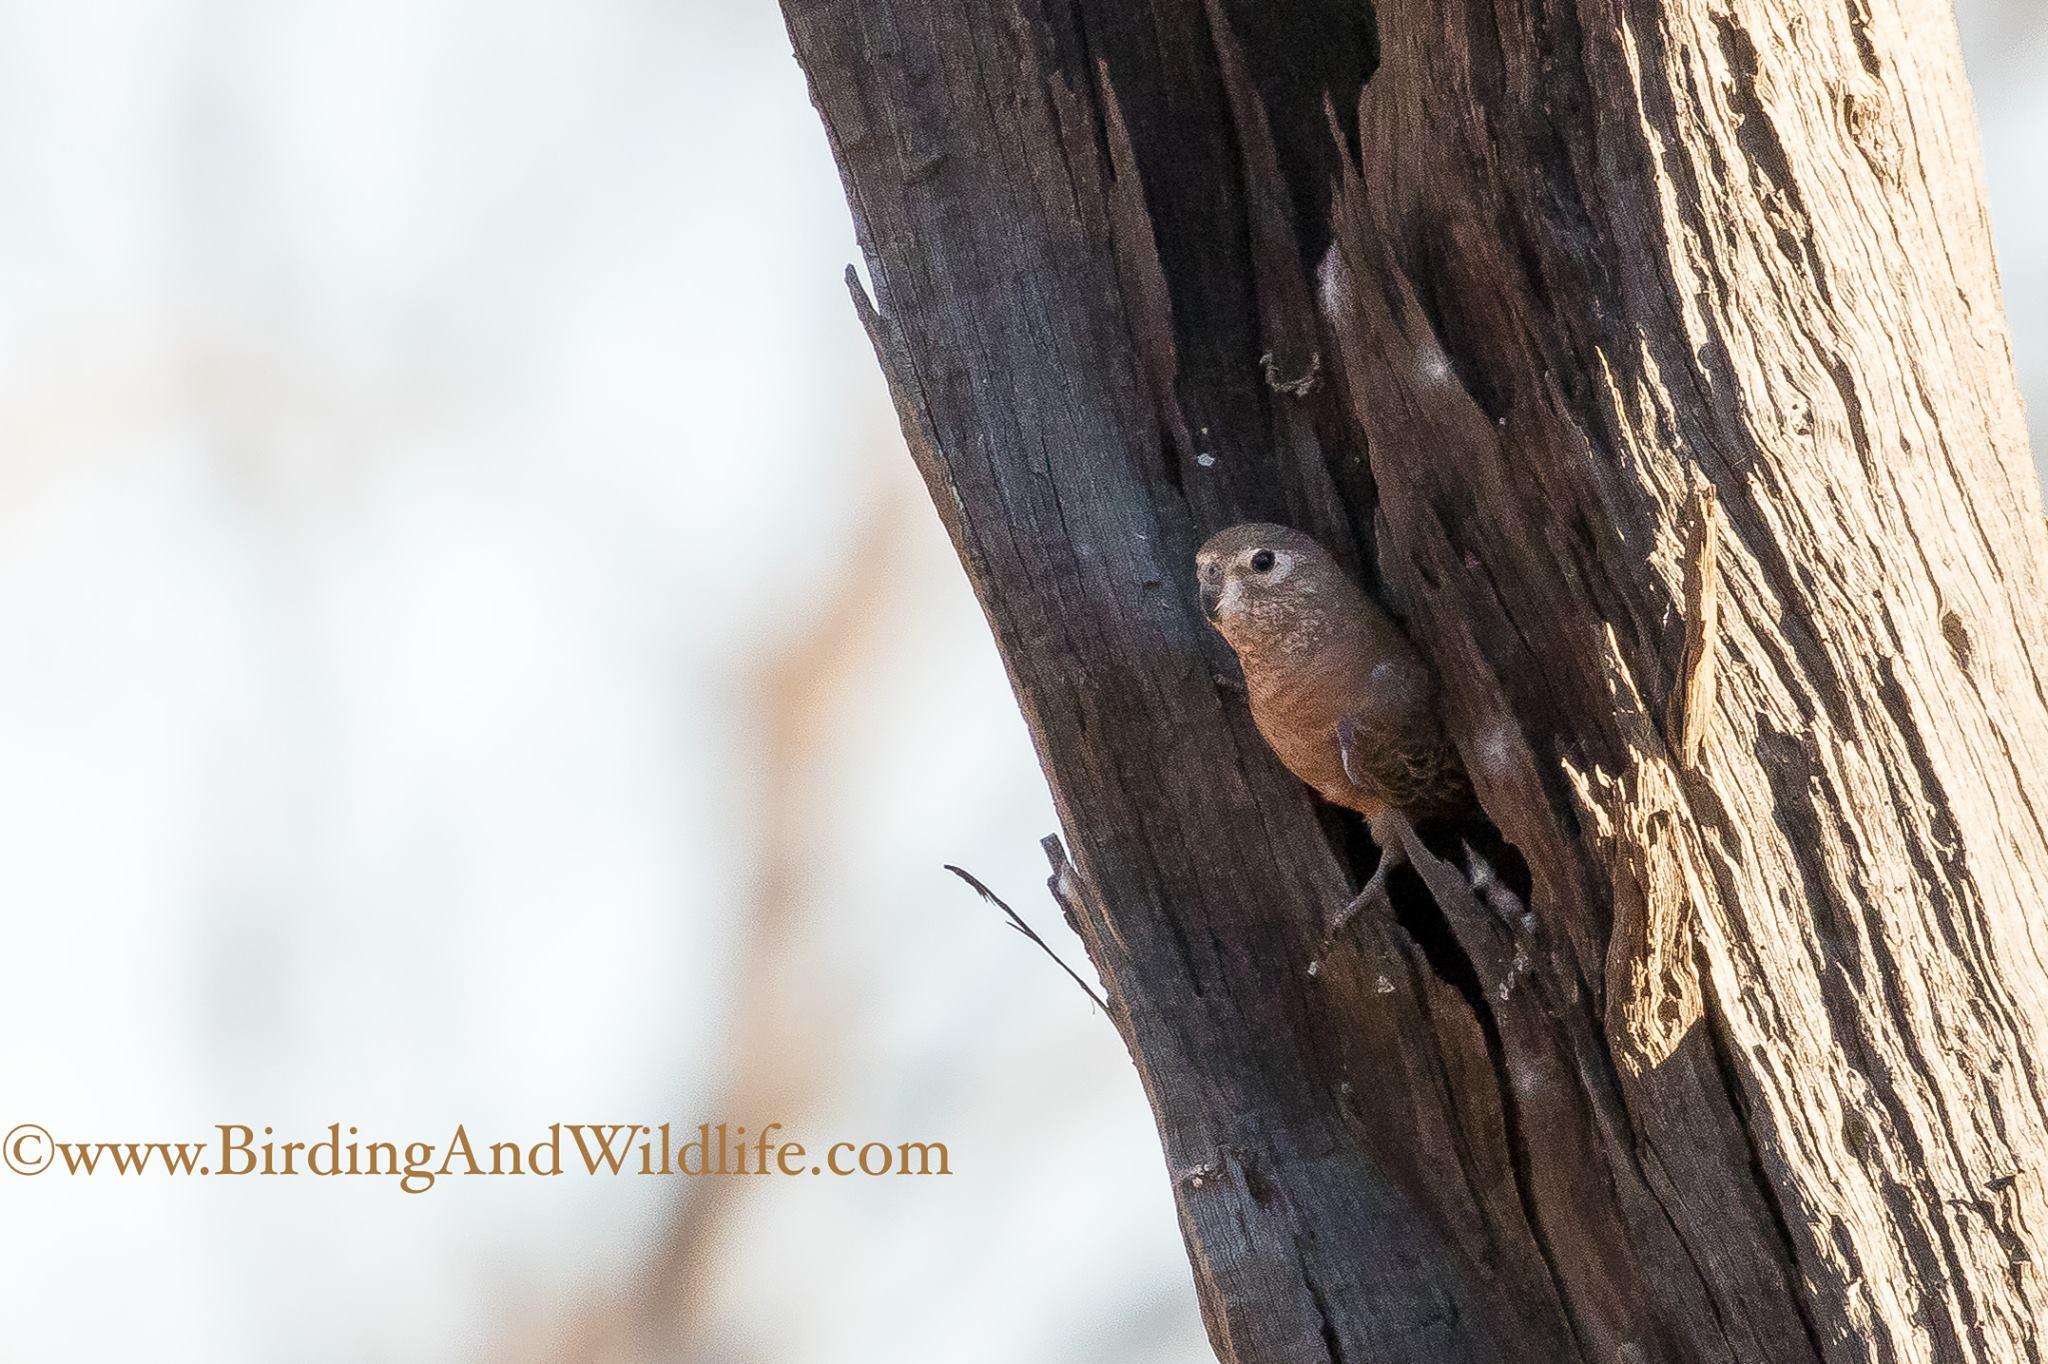 Bourke Parrot at the nest ©Mark Carter